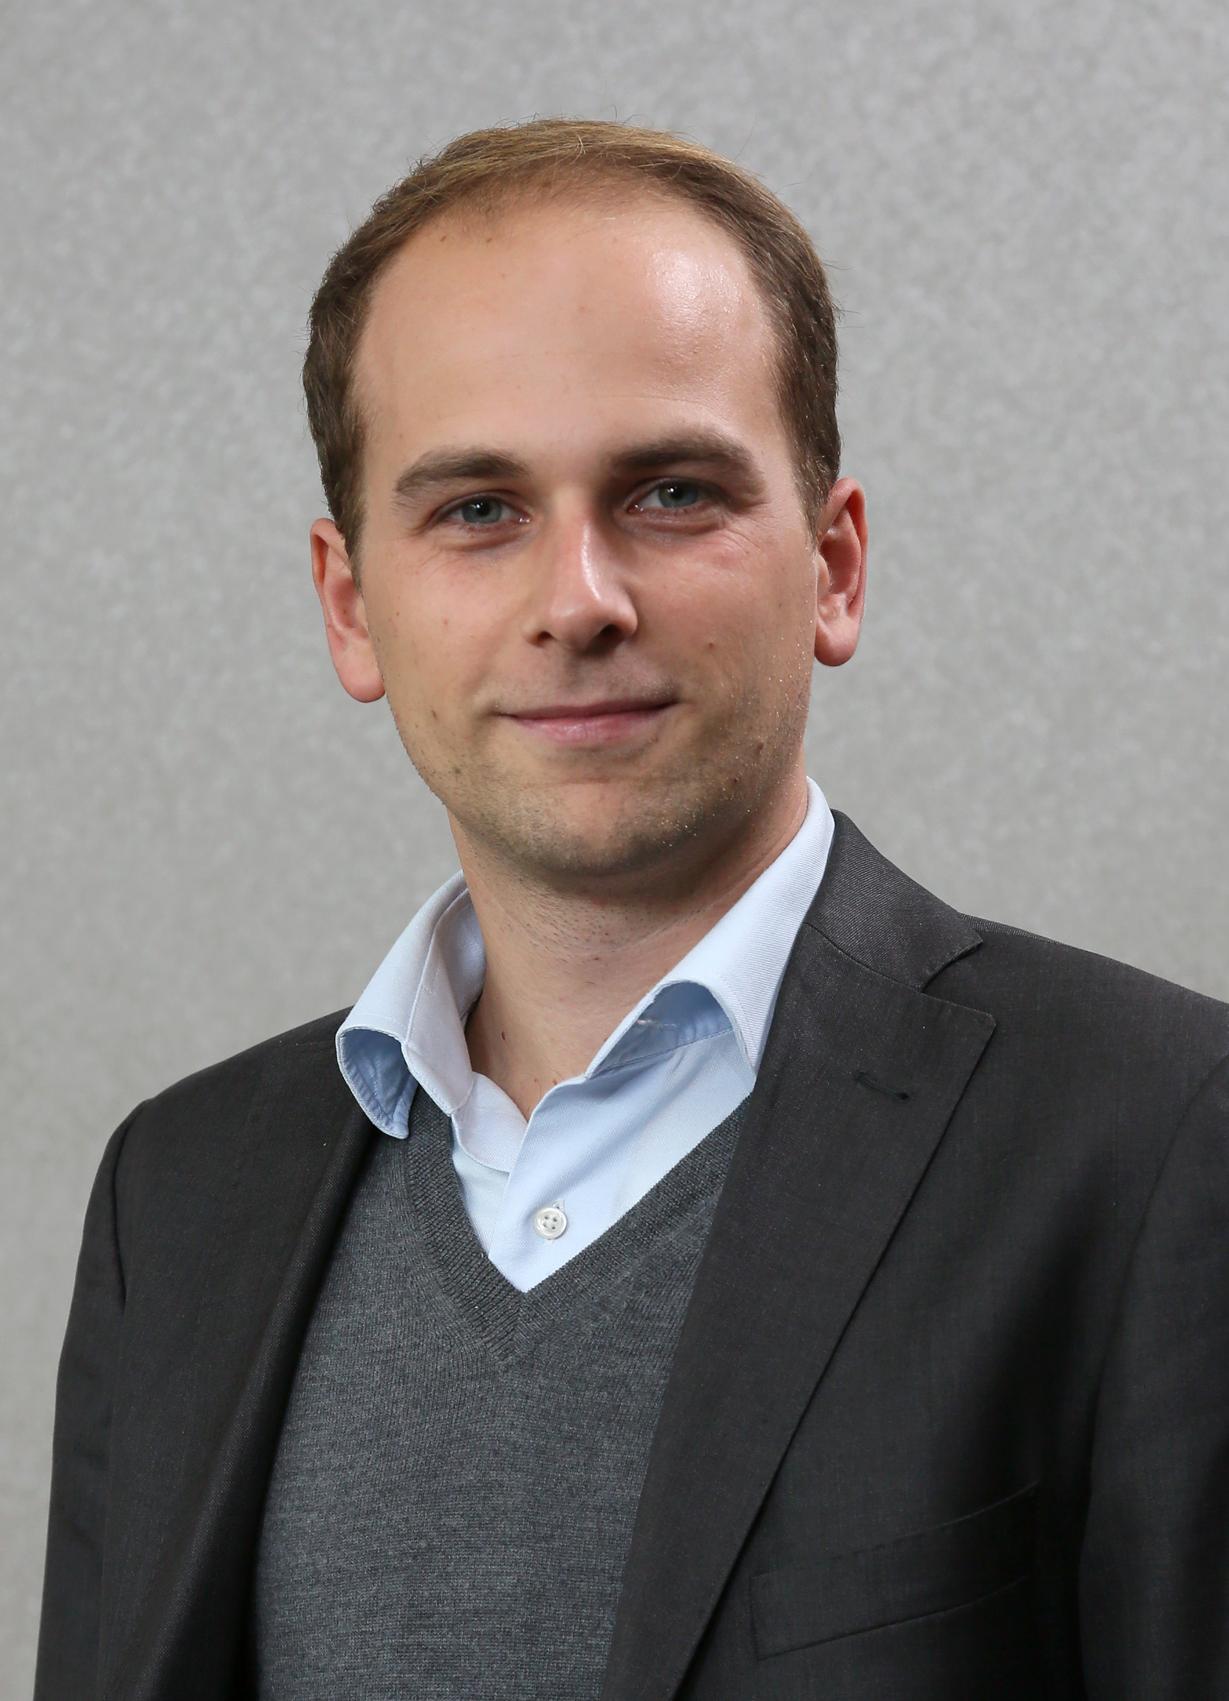 Raoul Roßmann